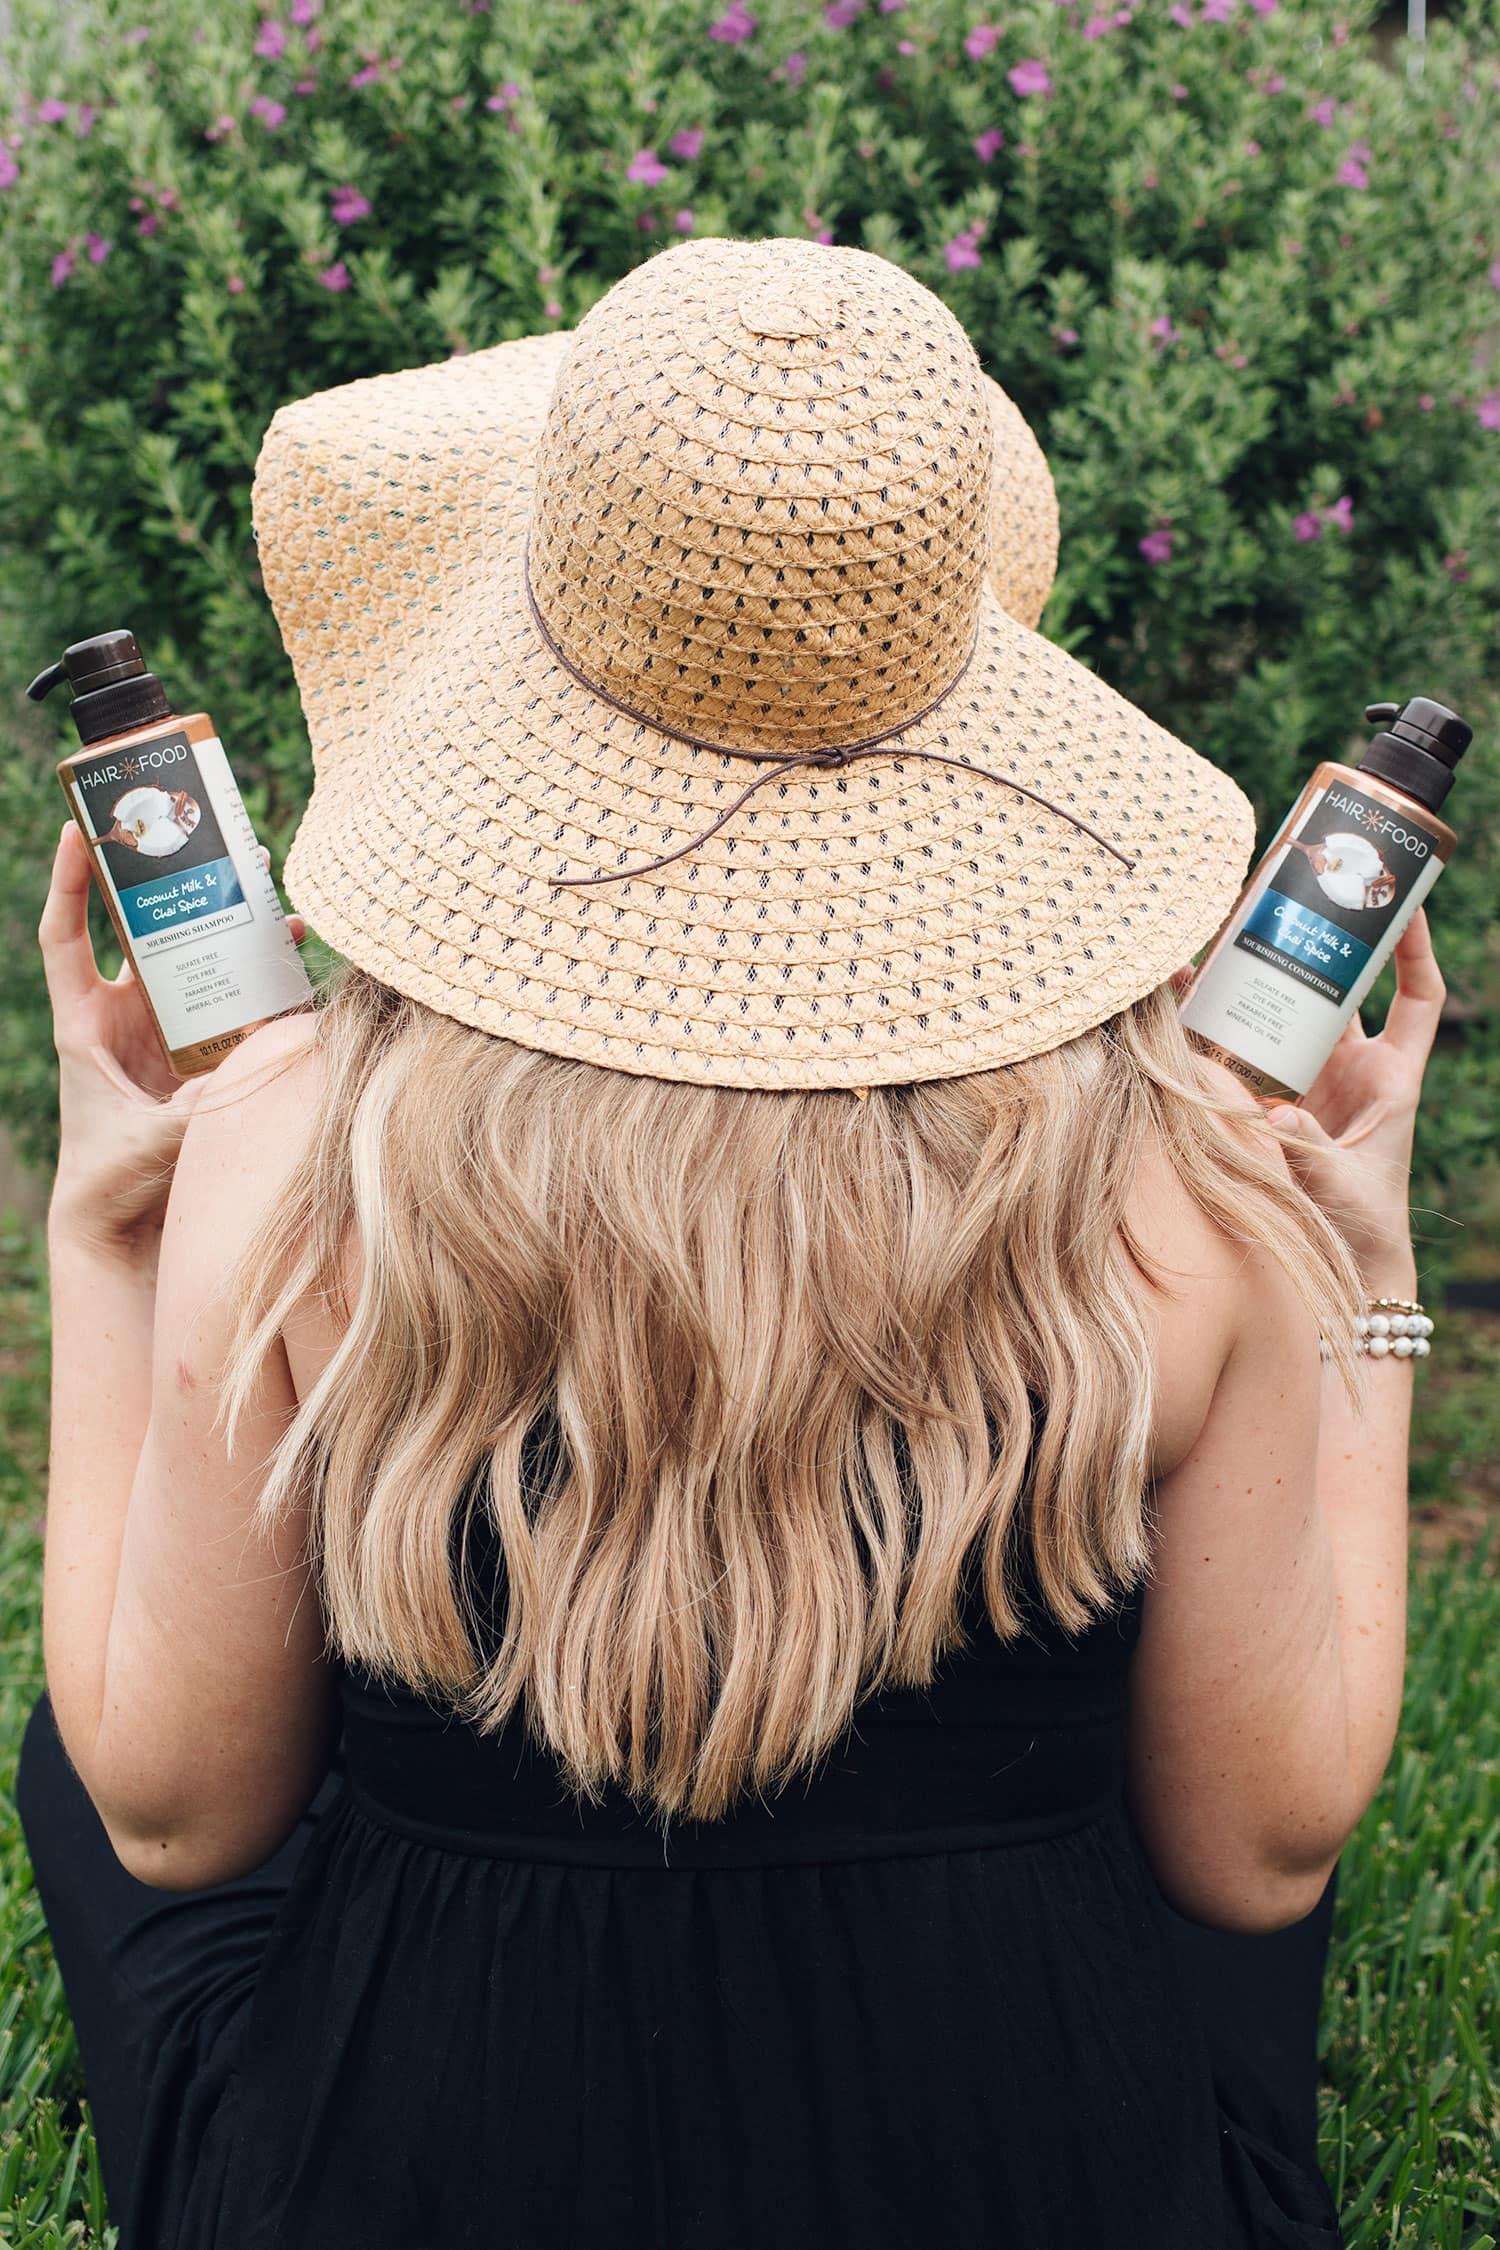 Houston beauty blogger Meg O. on the Go shares how to keep your hair healthy in summer